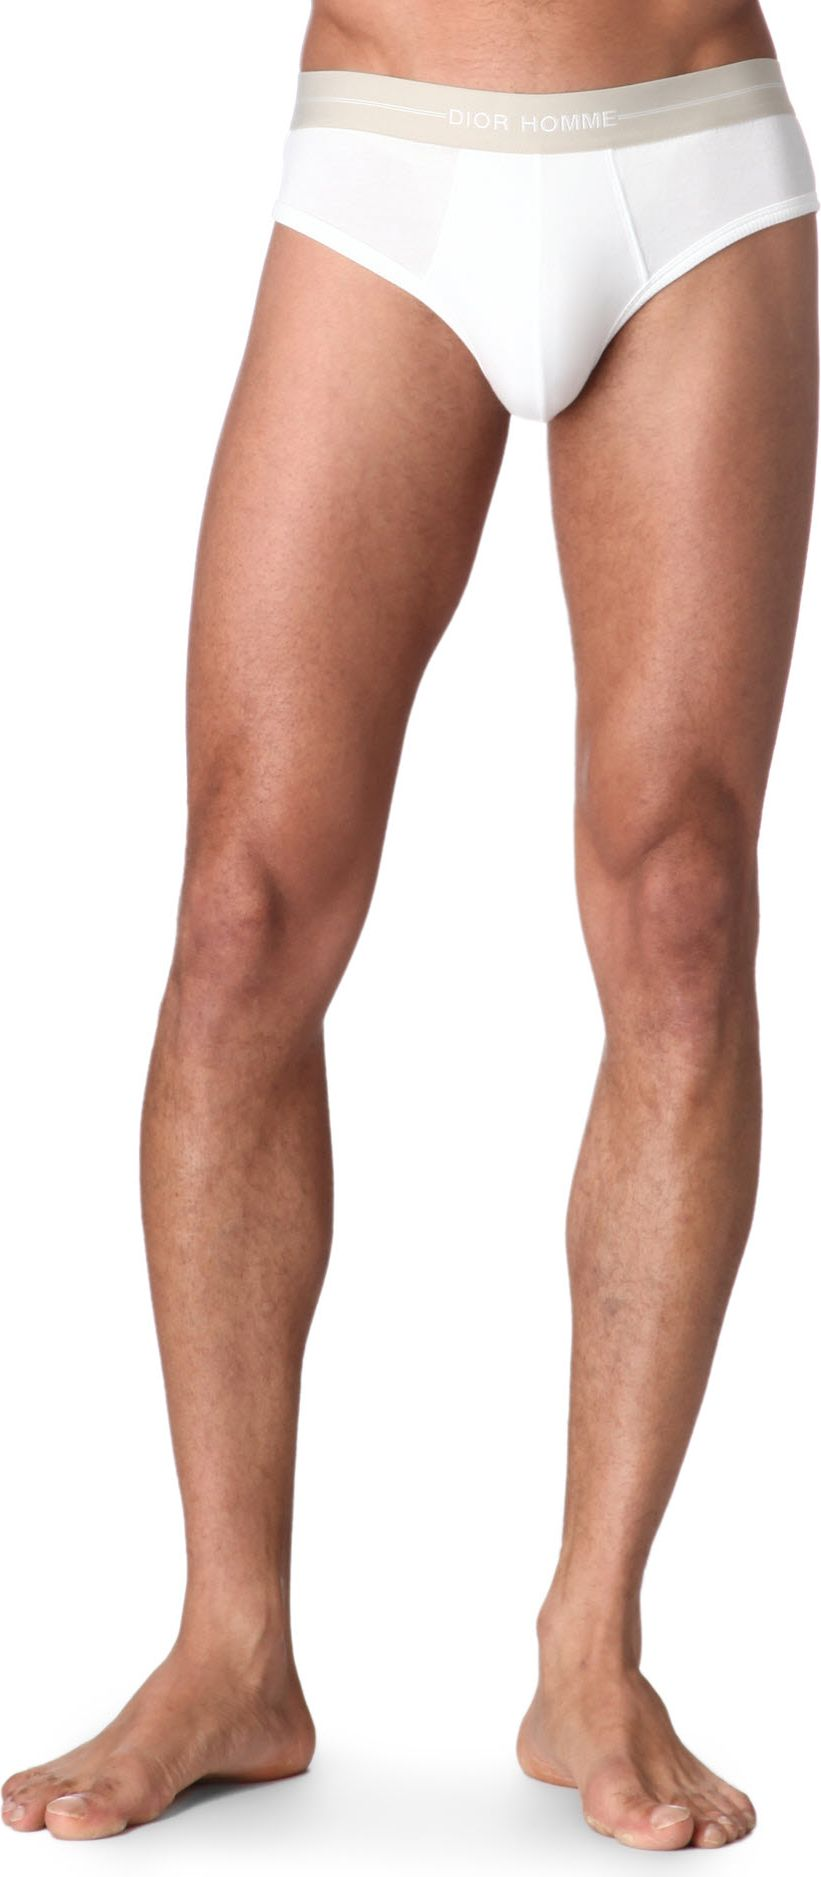 Underwear: How to Stretch It?